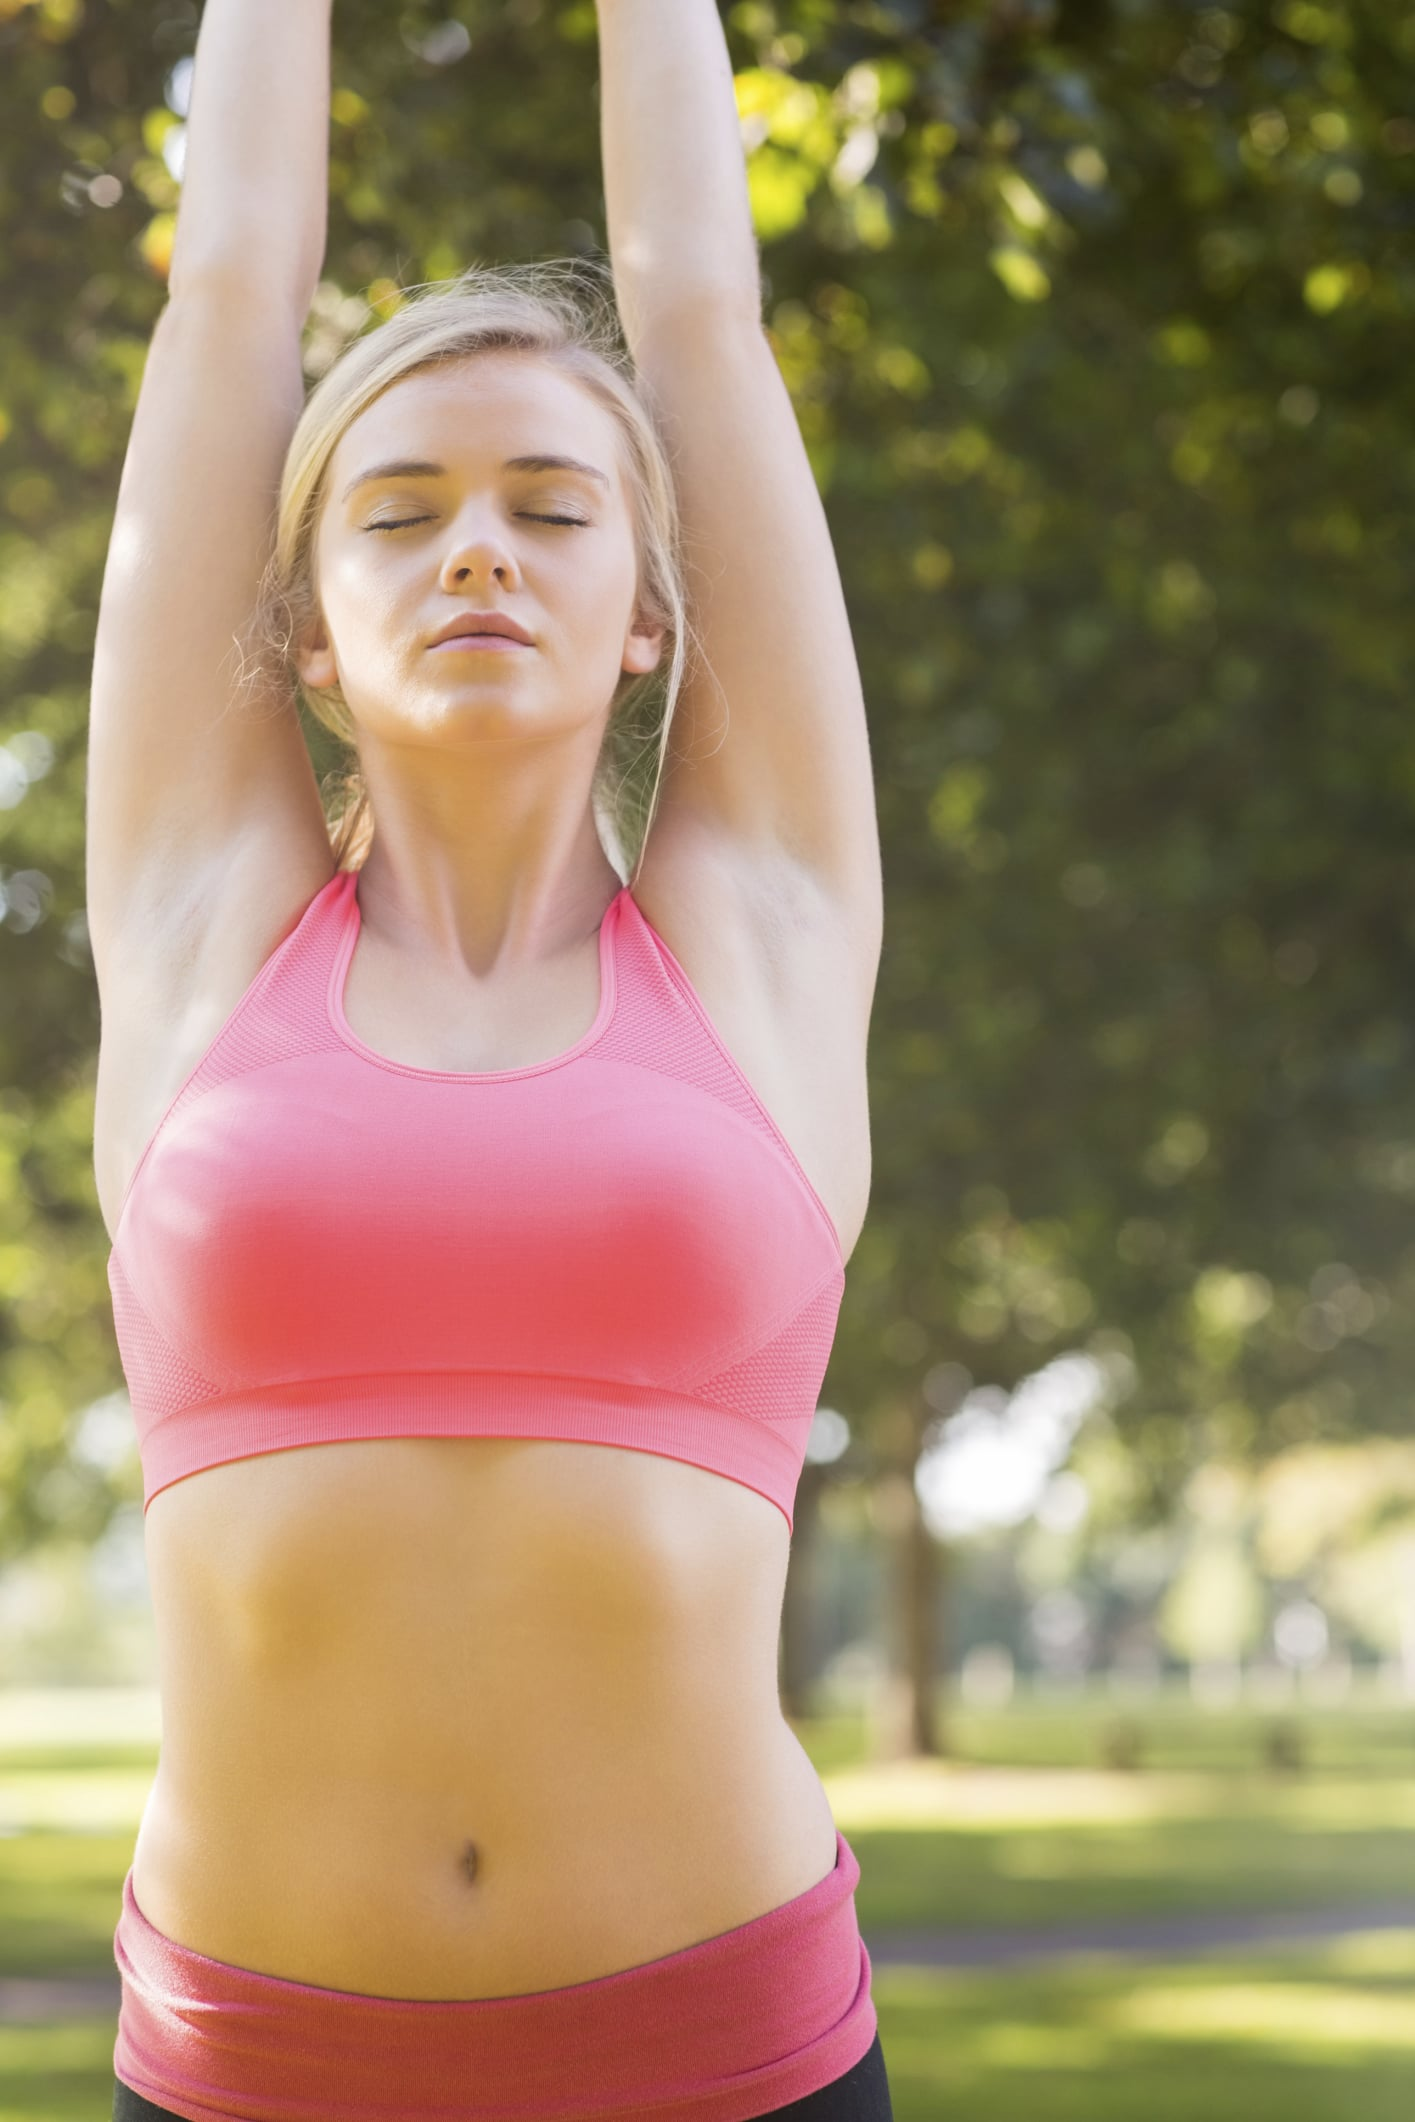 a7e307993eb84 How to Pick the Right Sports Bra